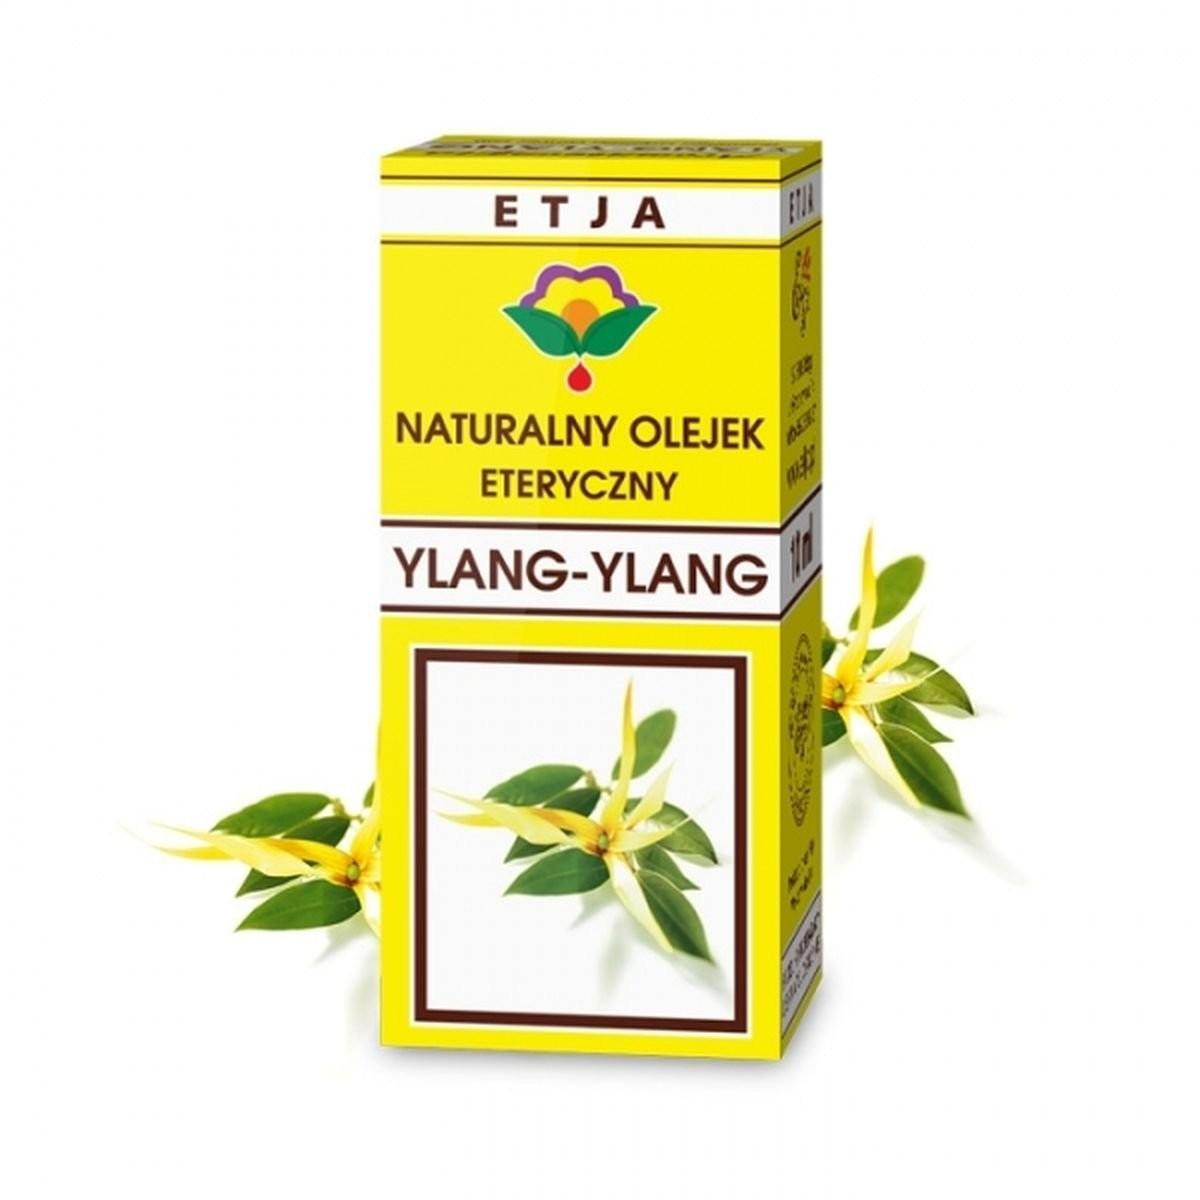 Etja Etja, olejek eteryczny ylang-ylang, 10 ml